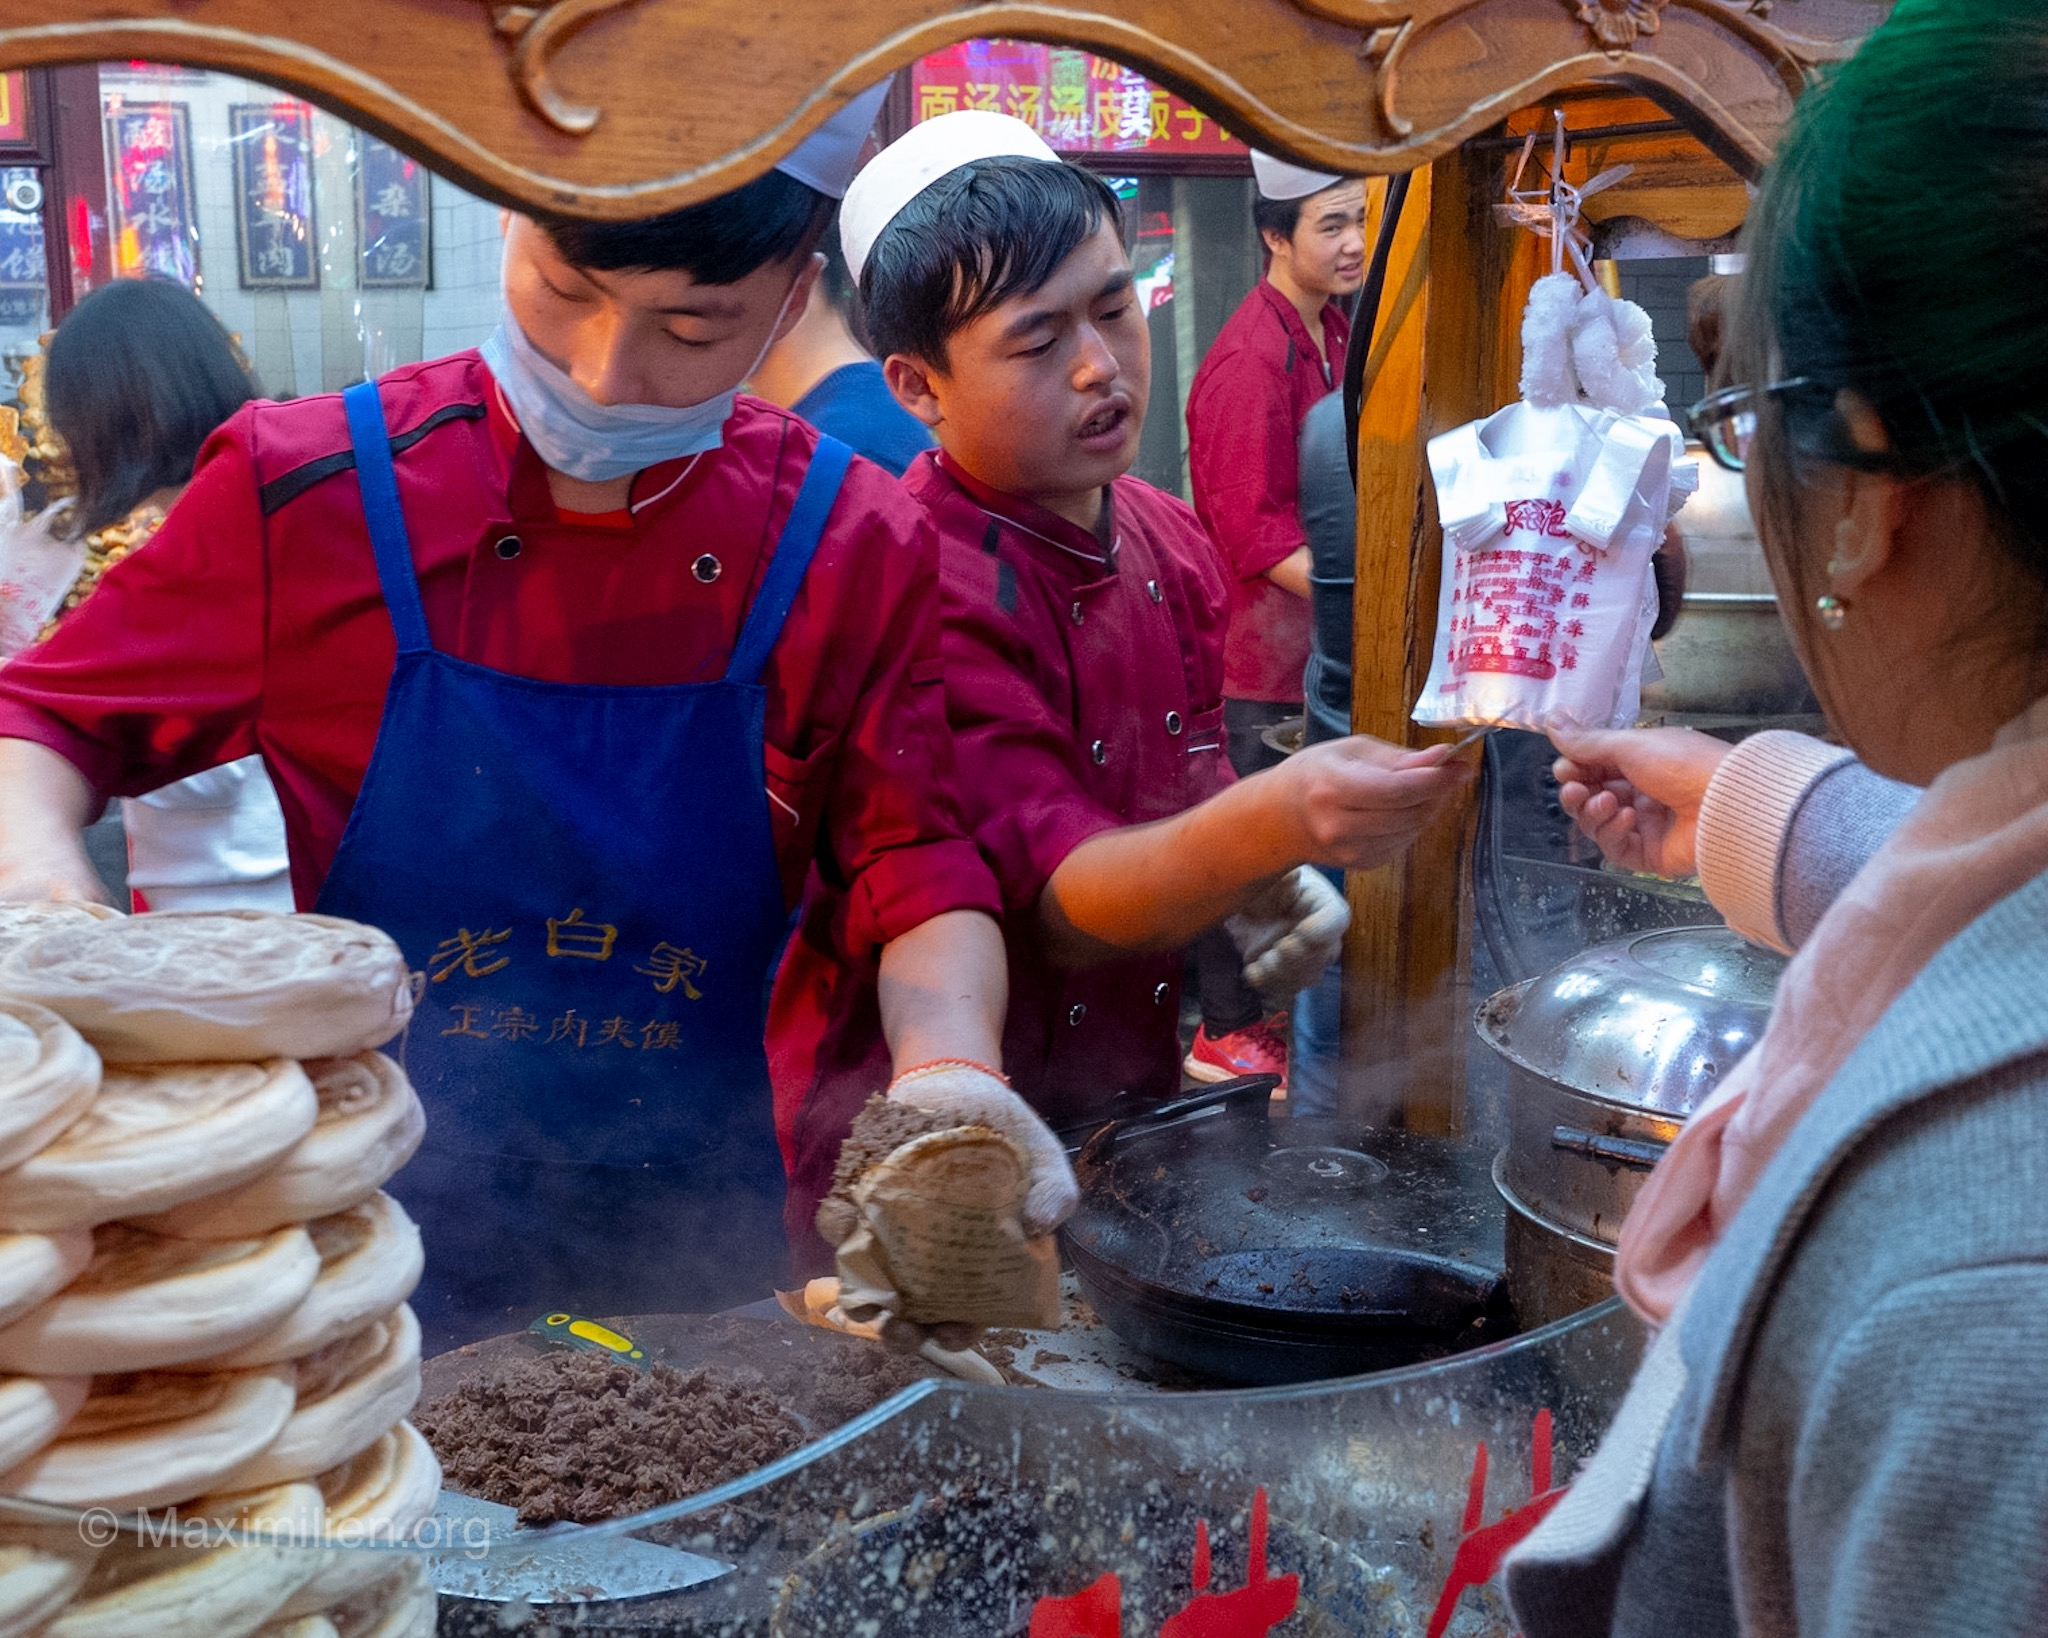 Muslim market in Xi'an, China